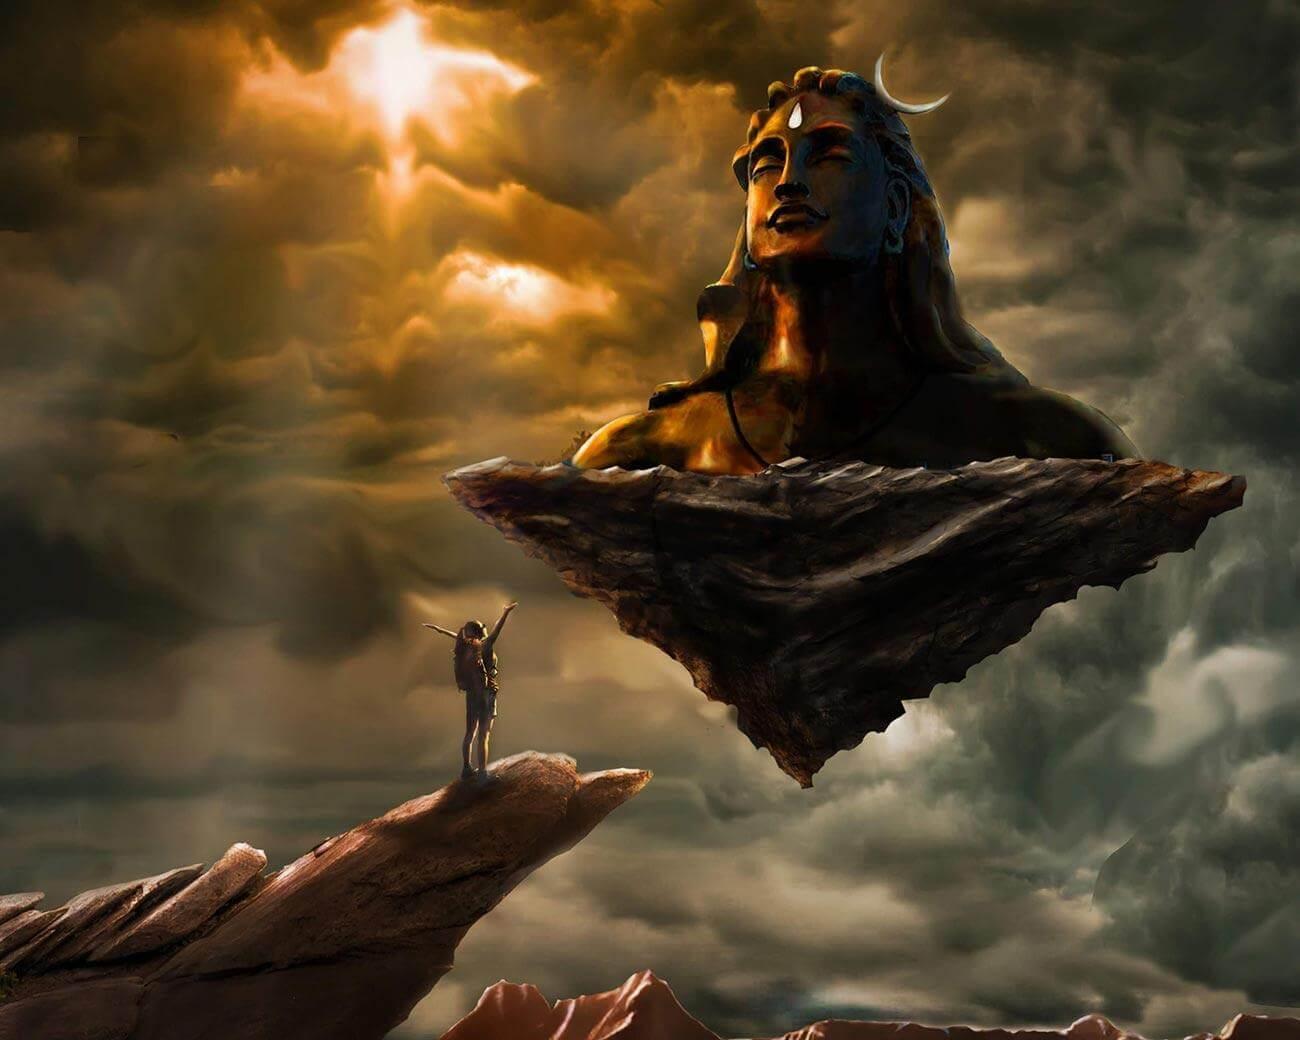 Akharvagarvasarvamangala Kalakadambamajnjari रावण रचित शिव तांडव स्तोत्र बोल और अर्थ Shiv Tandav Lyrics And Meaning Made By Ravan (13)